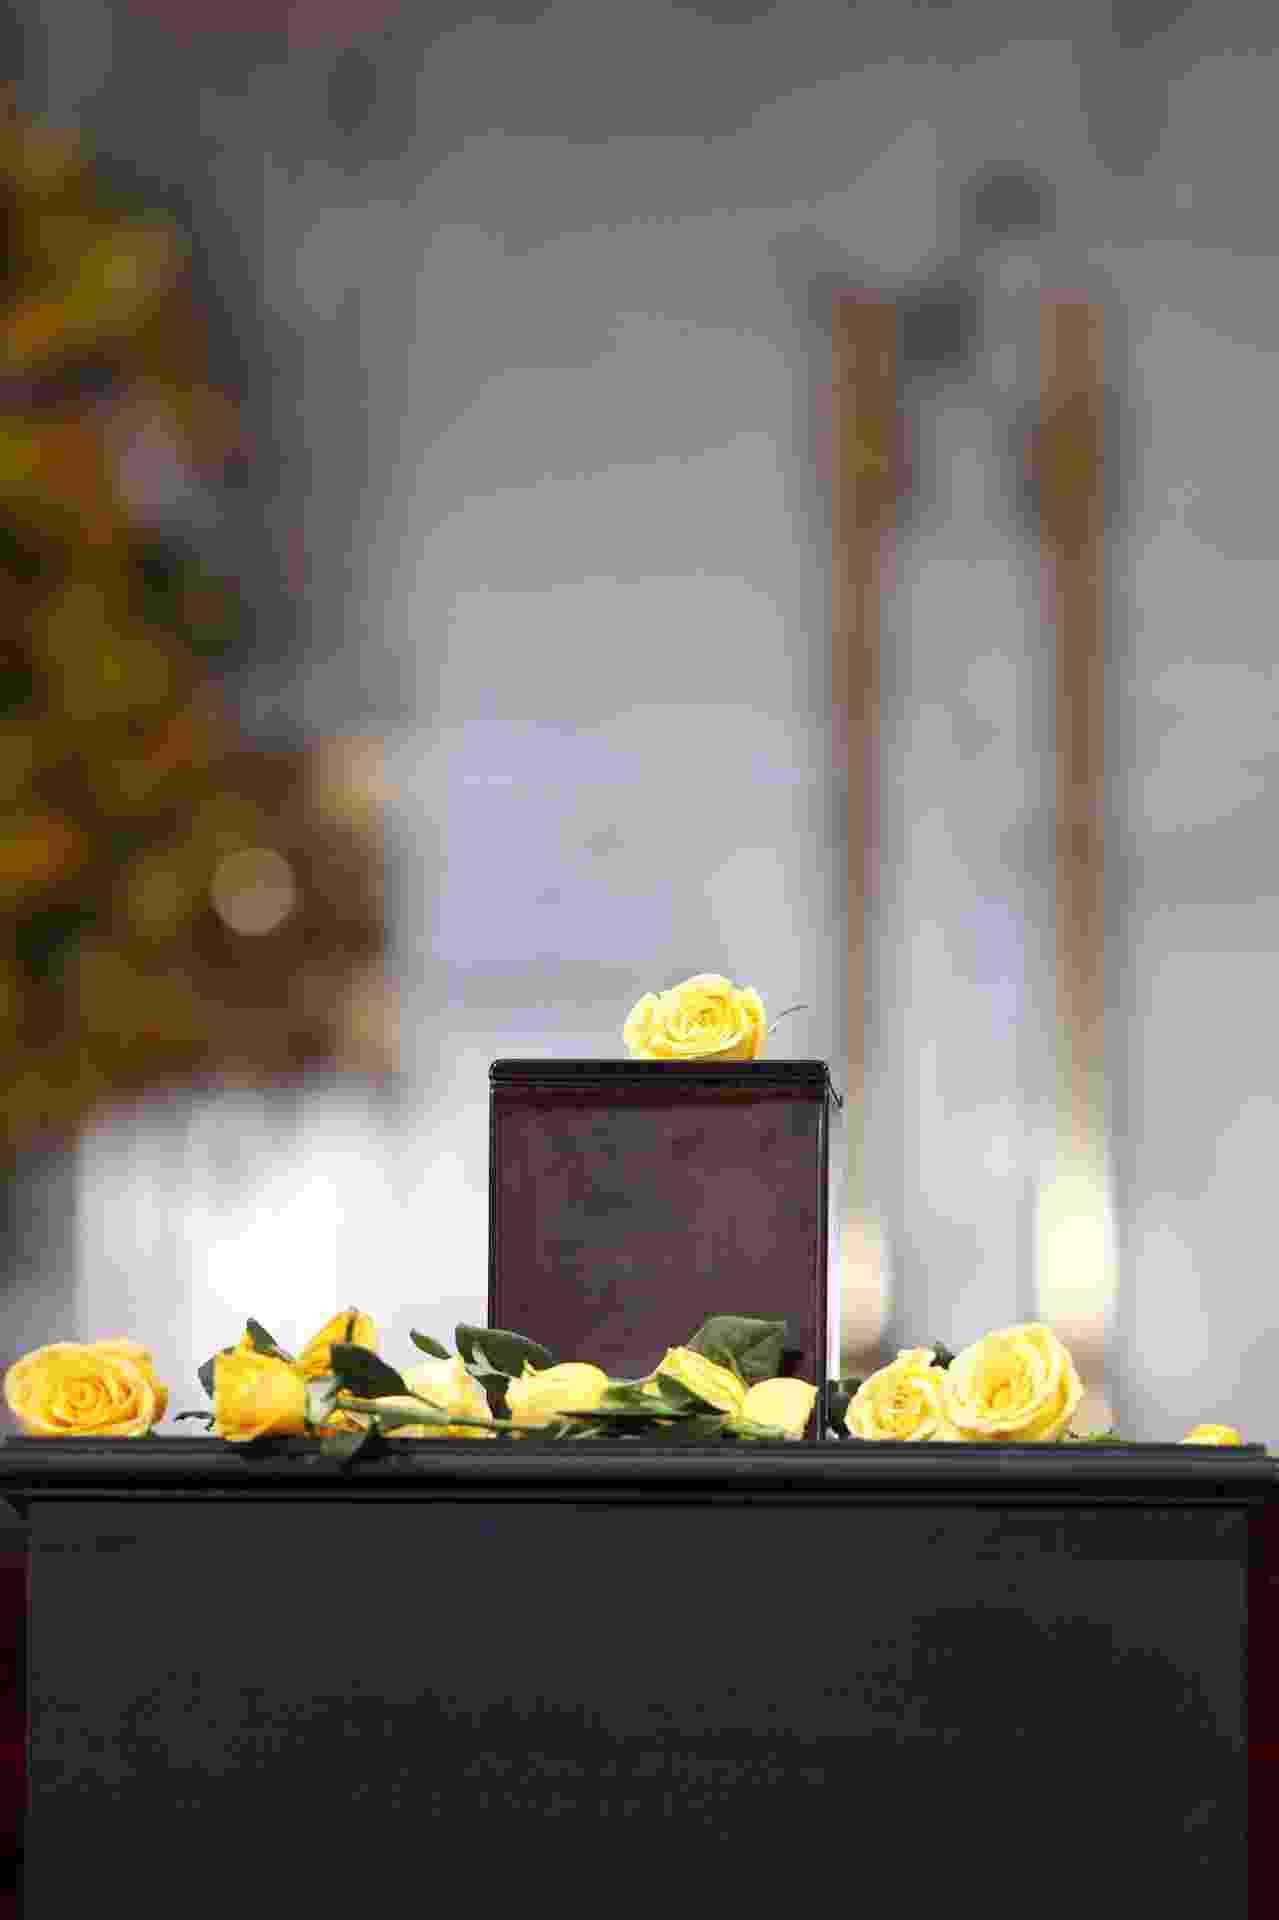 21.abr.2014 - Rosas amarelas enfeitam urna com as cinzas do Nobel de literatura Gabriel García Márquez durante tributo no Palácio de Belas Artes da Cidade do México - José Méndez/EFE